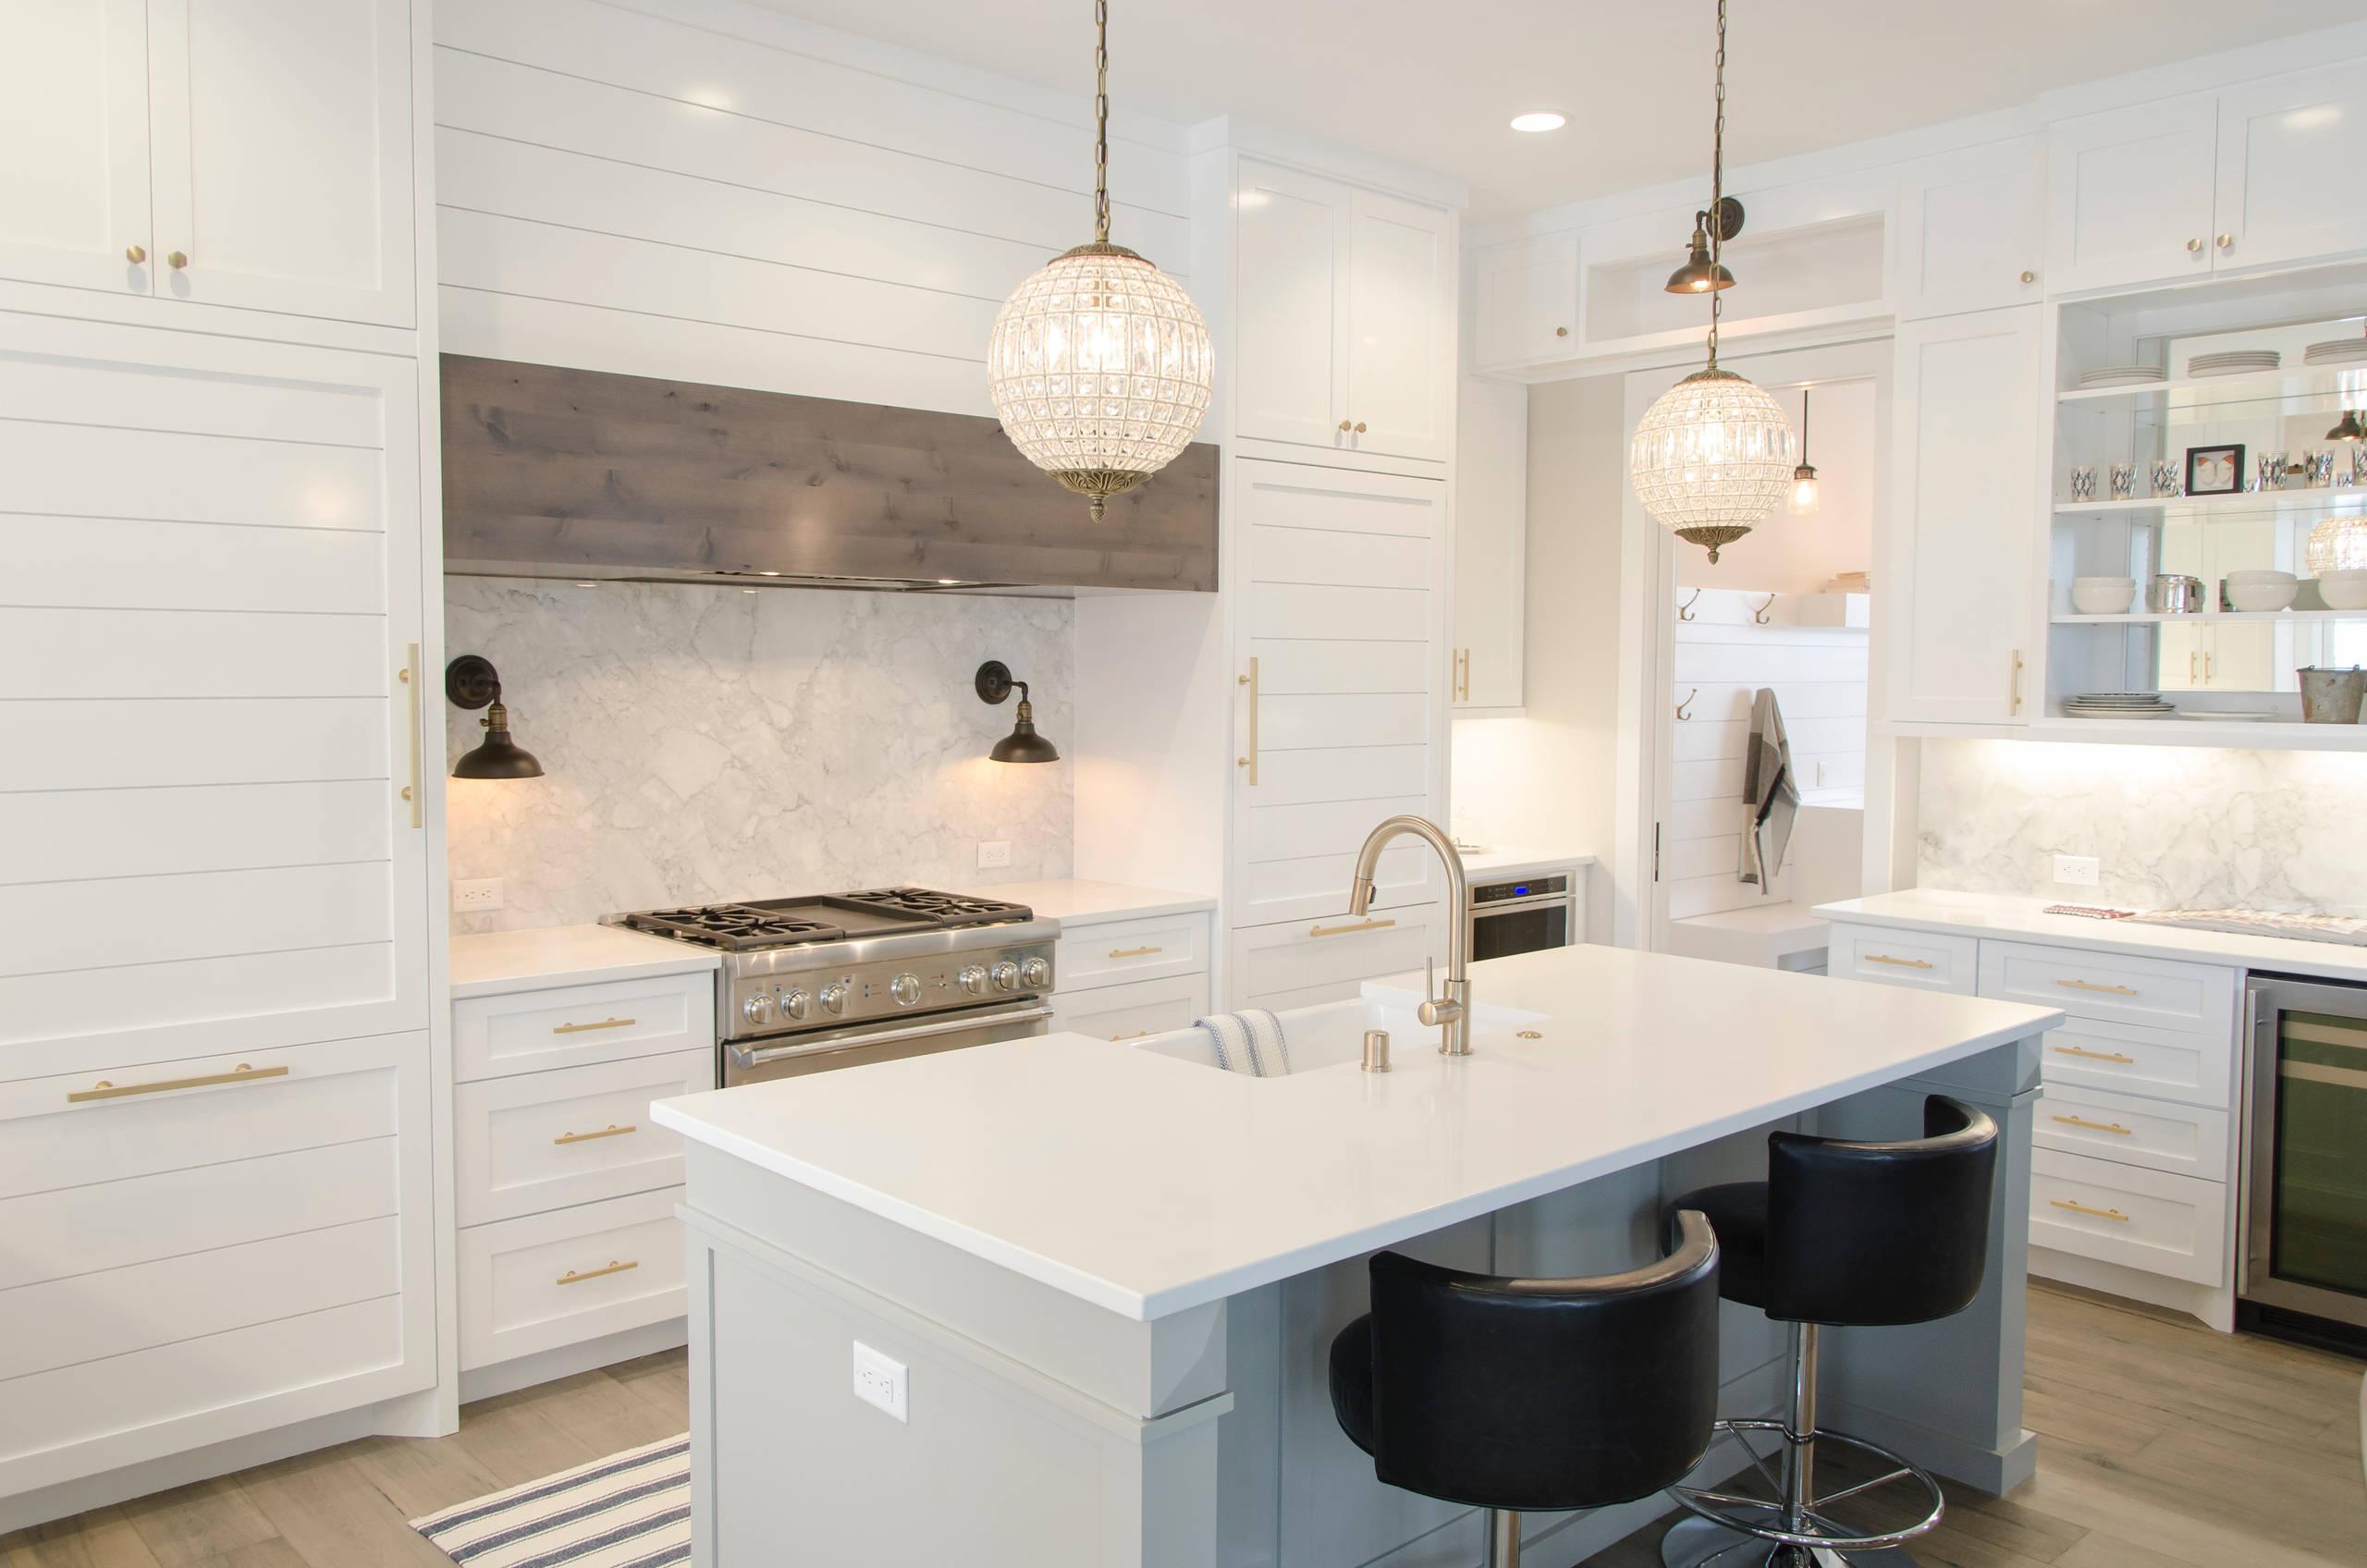 Cabinet Refacing,White shaker style,Custom island